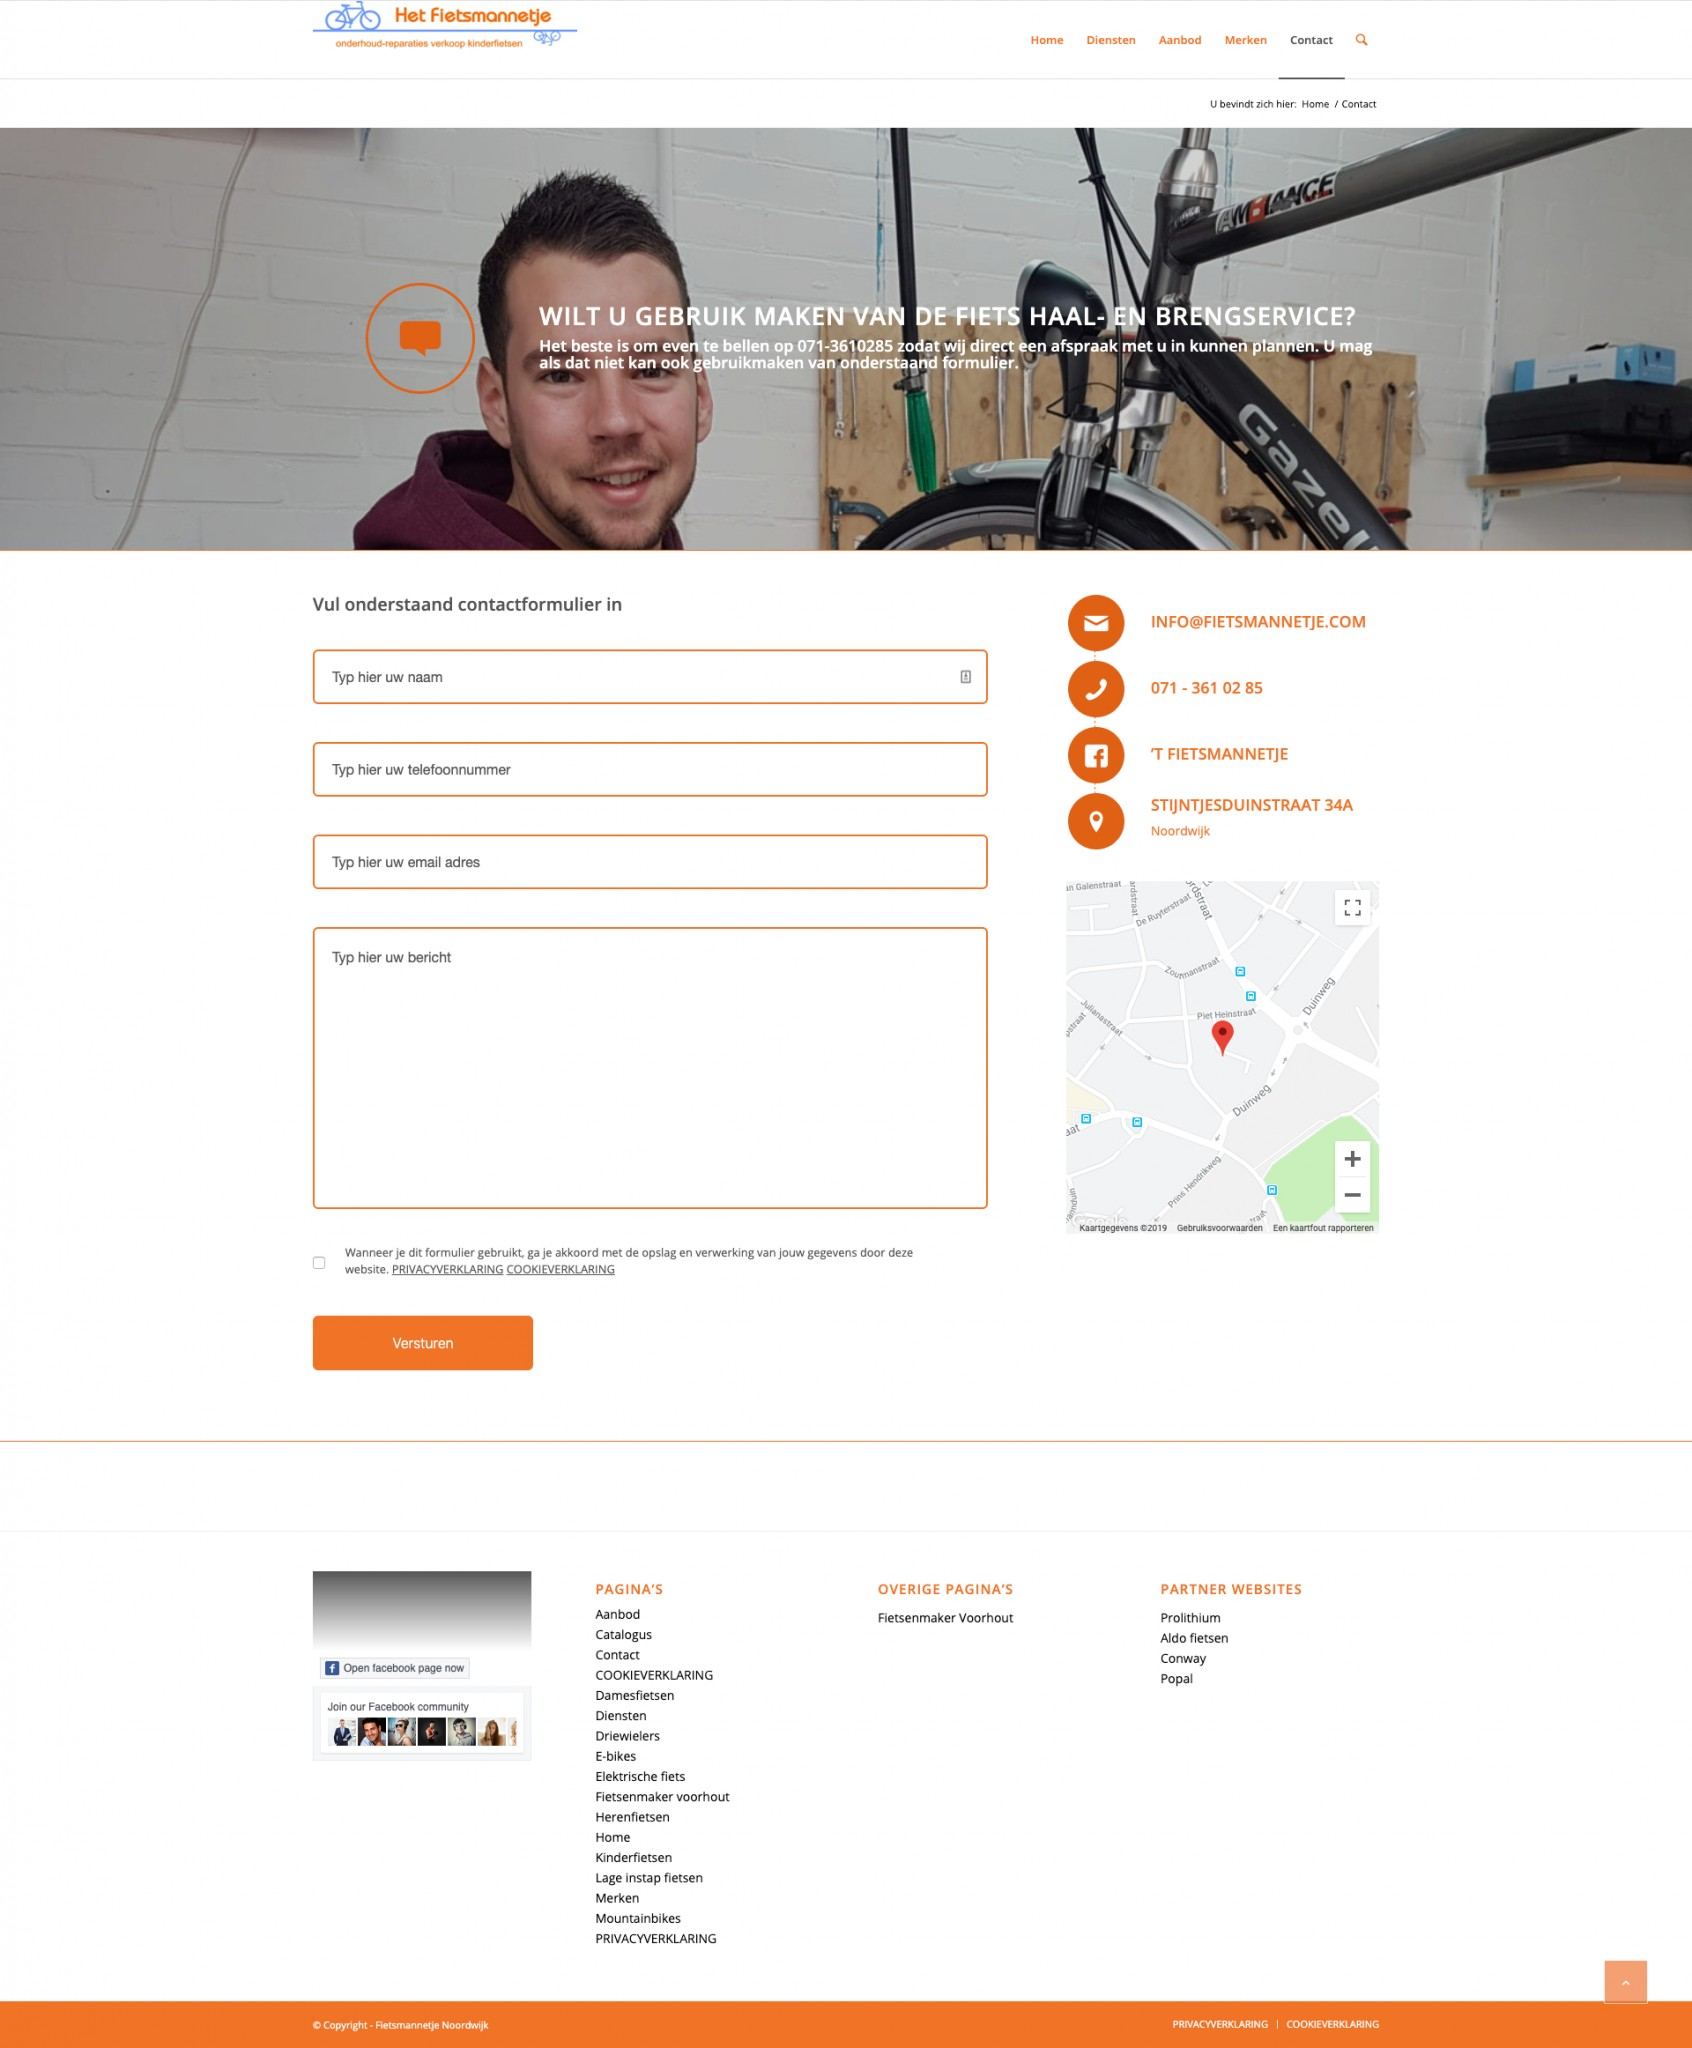 Fietsmannetje - Contact